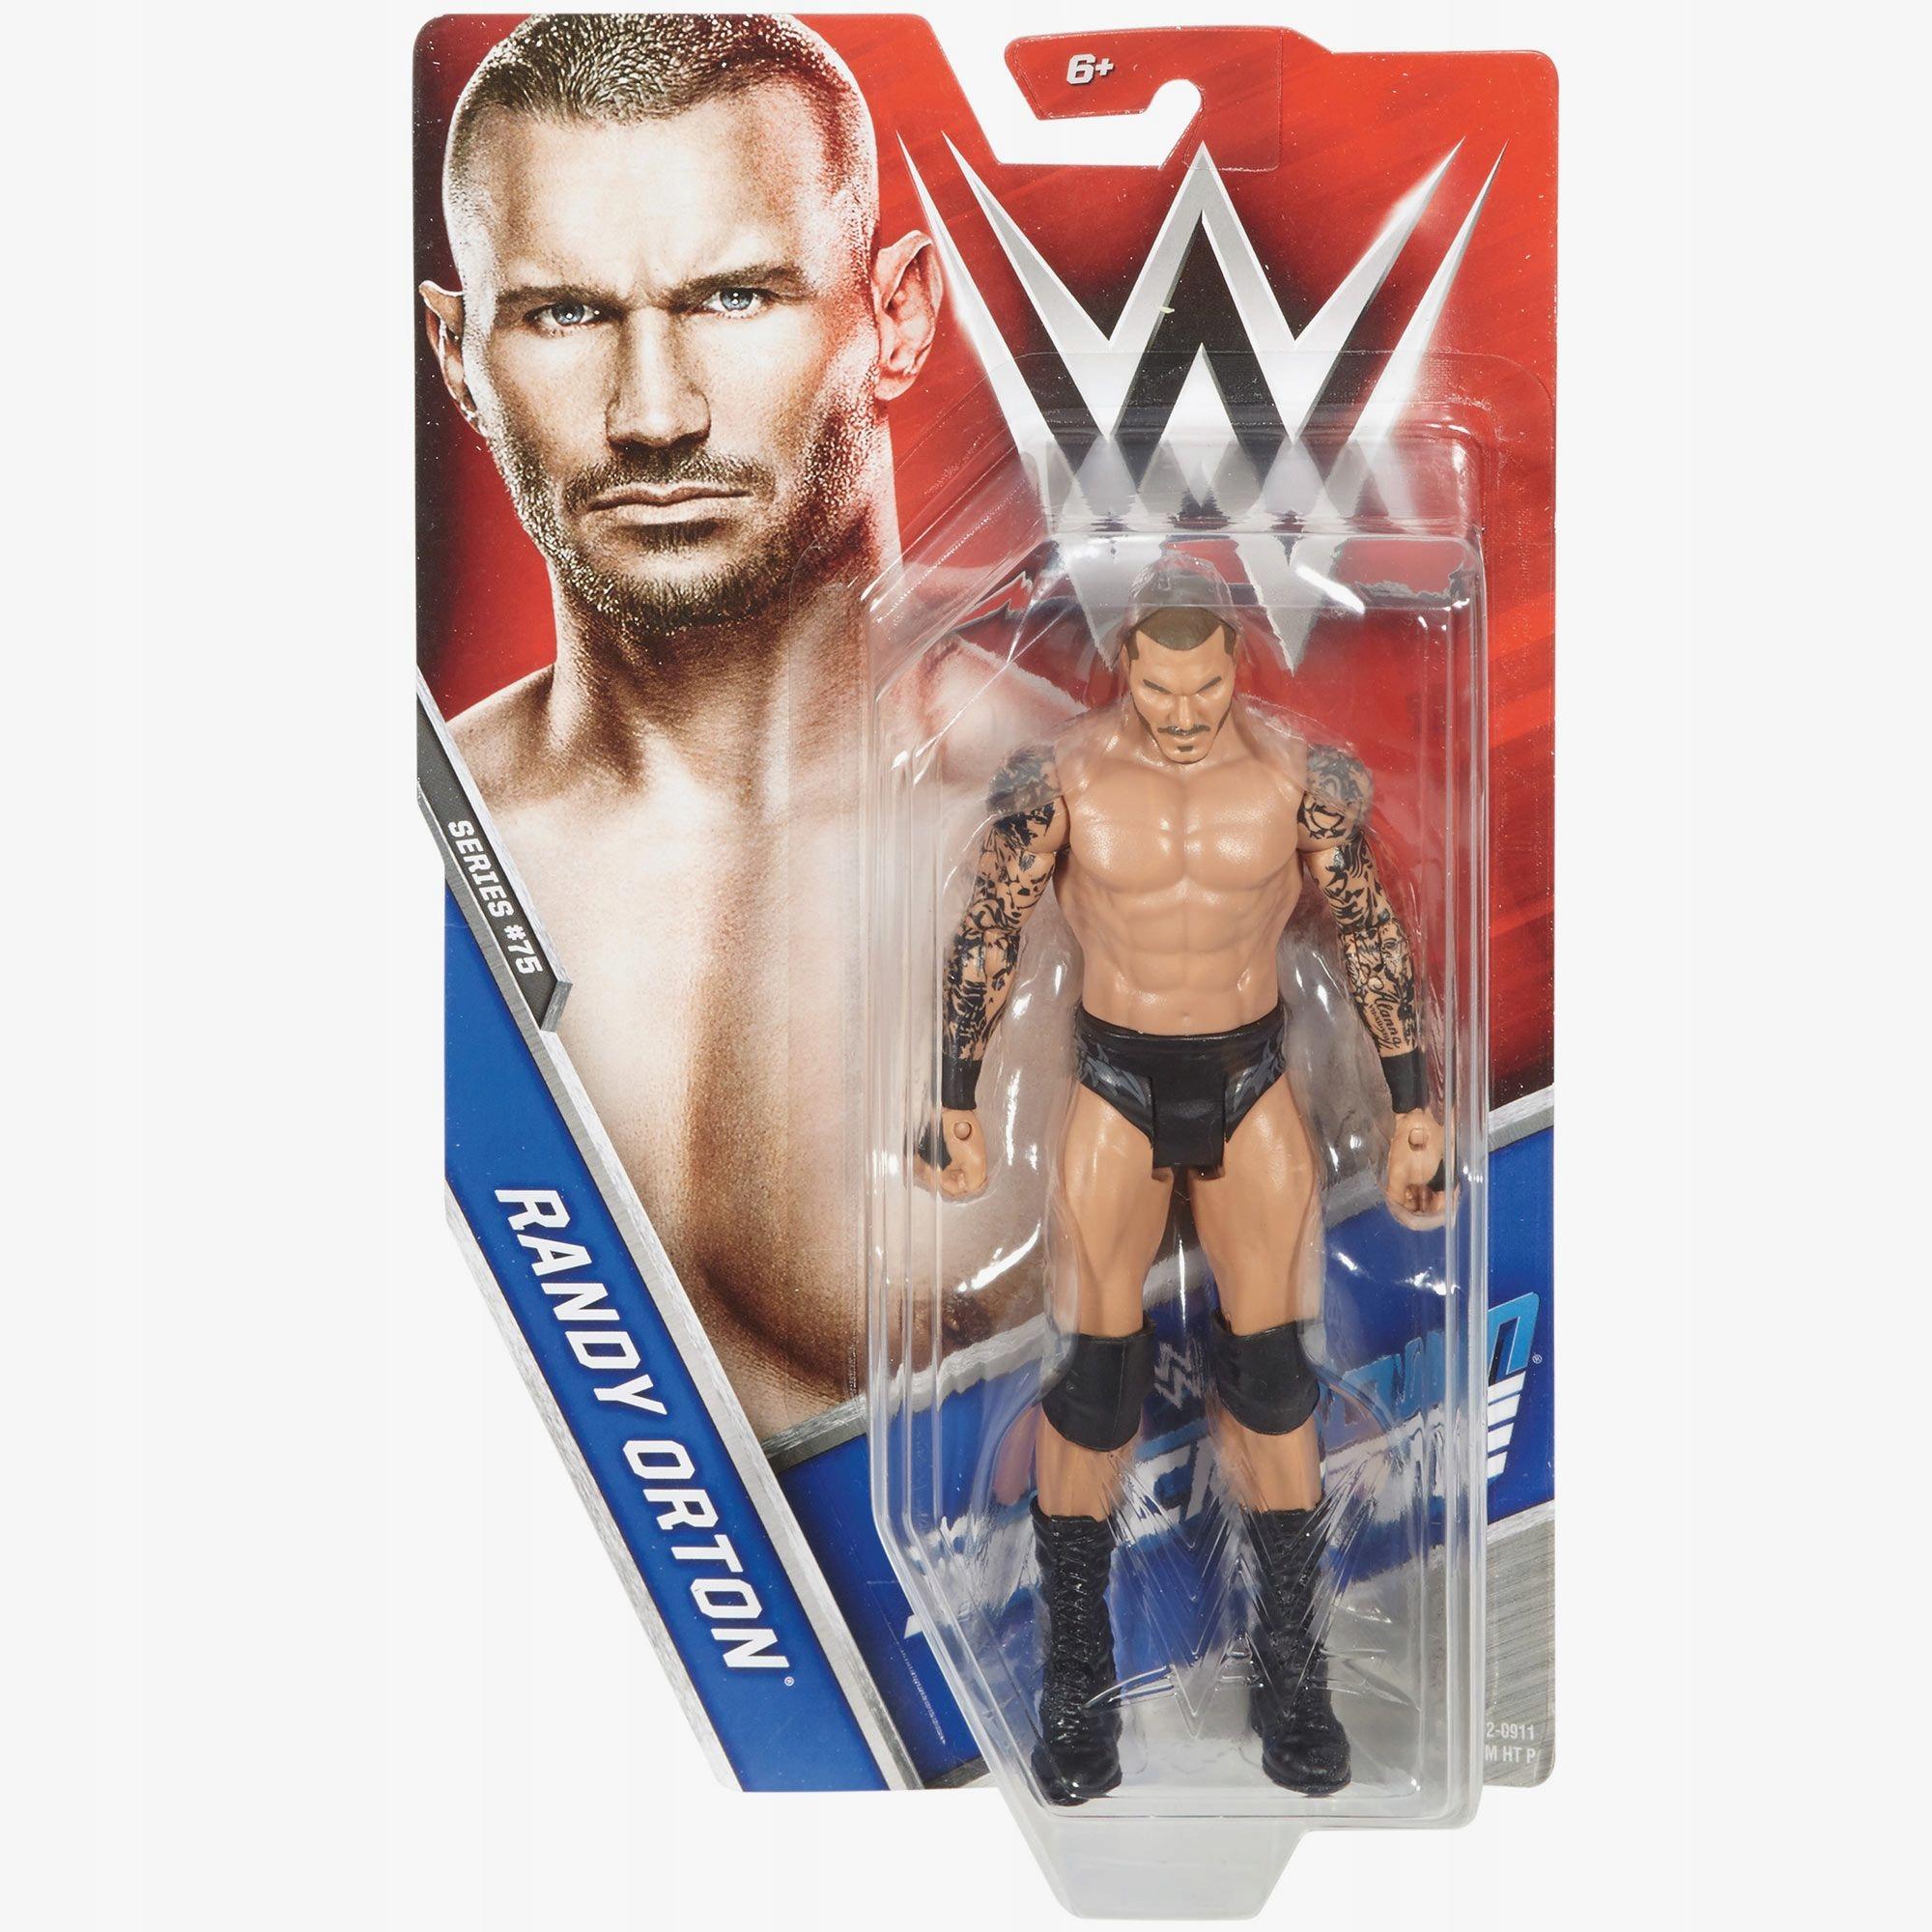 Wwe Randy Orton Figurka Wrestling 75 Basic 7284774809